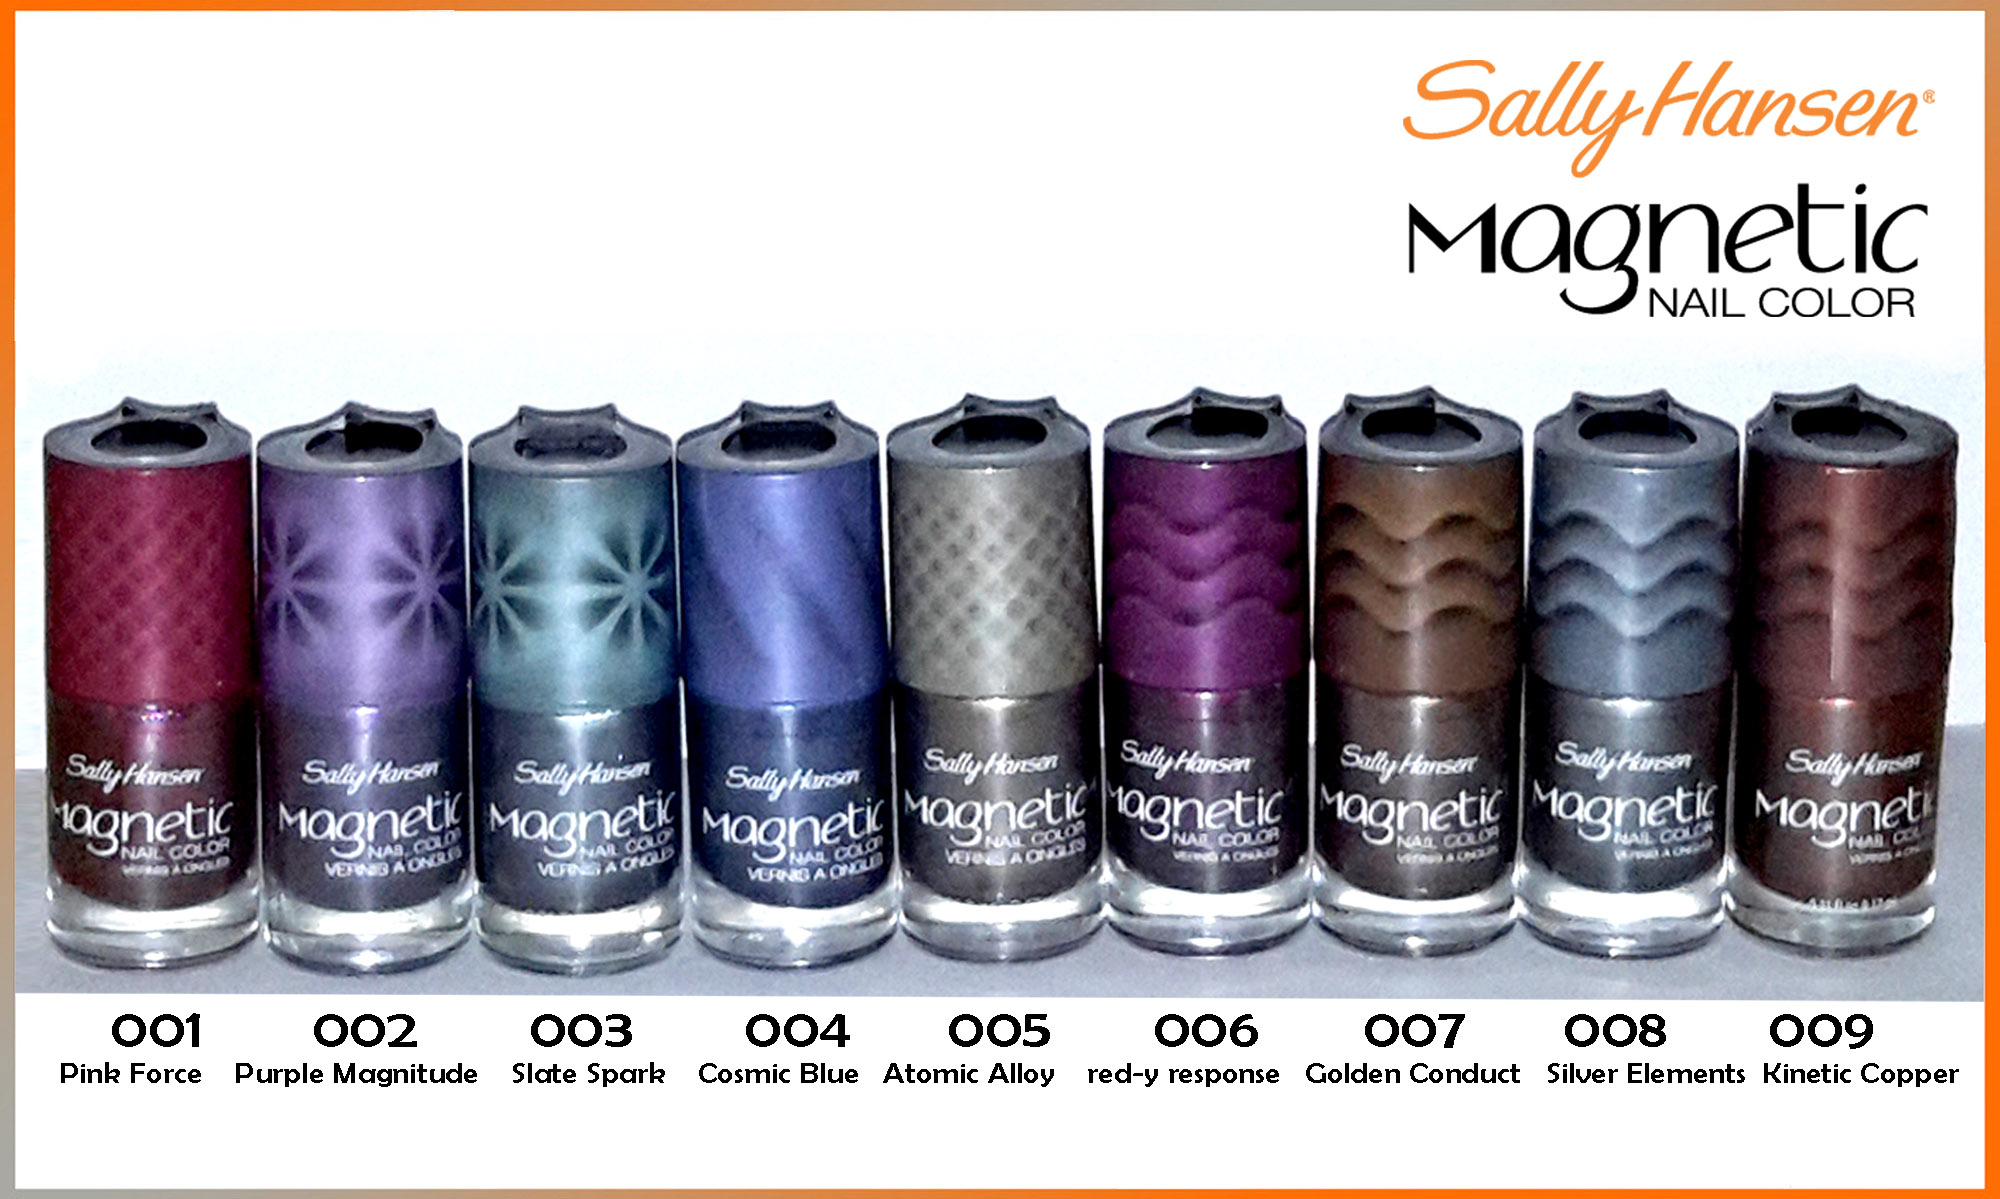 Sally Hansen Magnetic Nail Polish Walmart | Best Nail Designs 2018